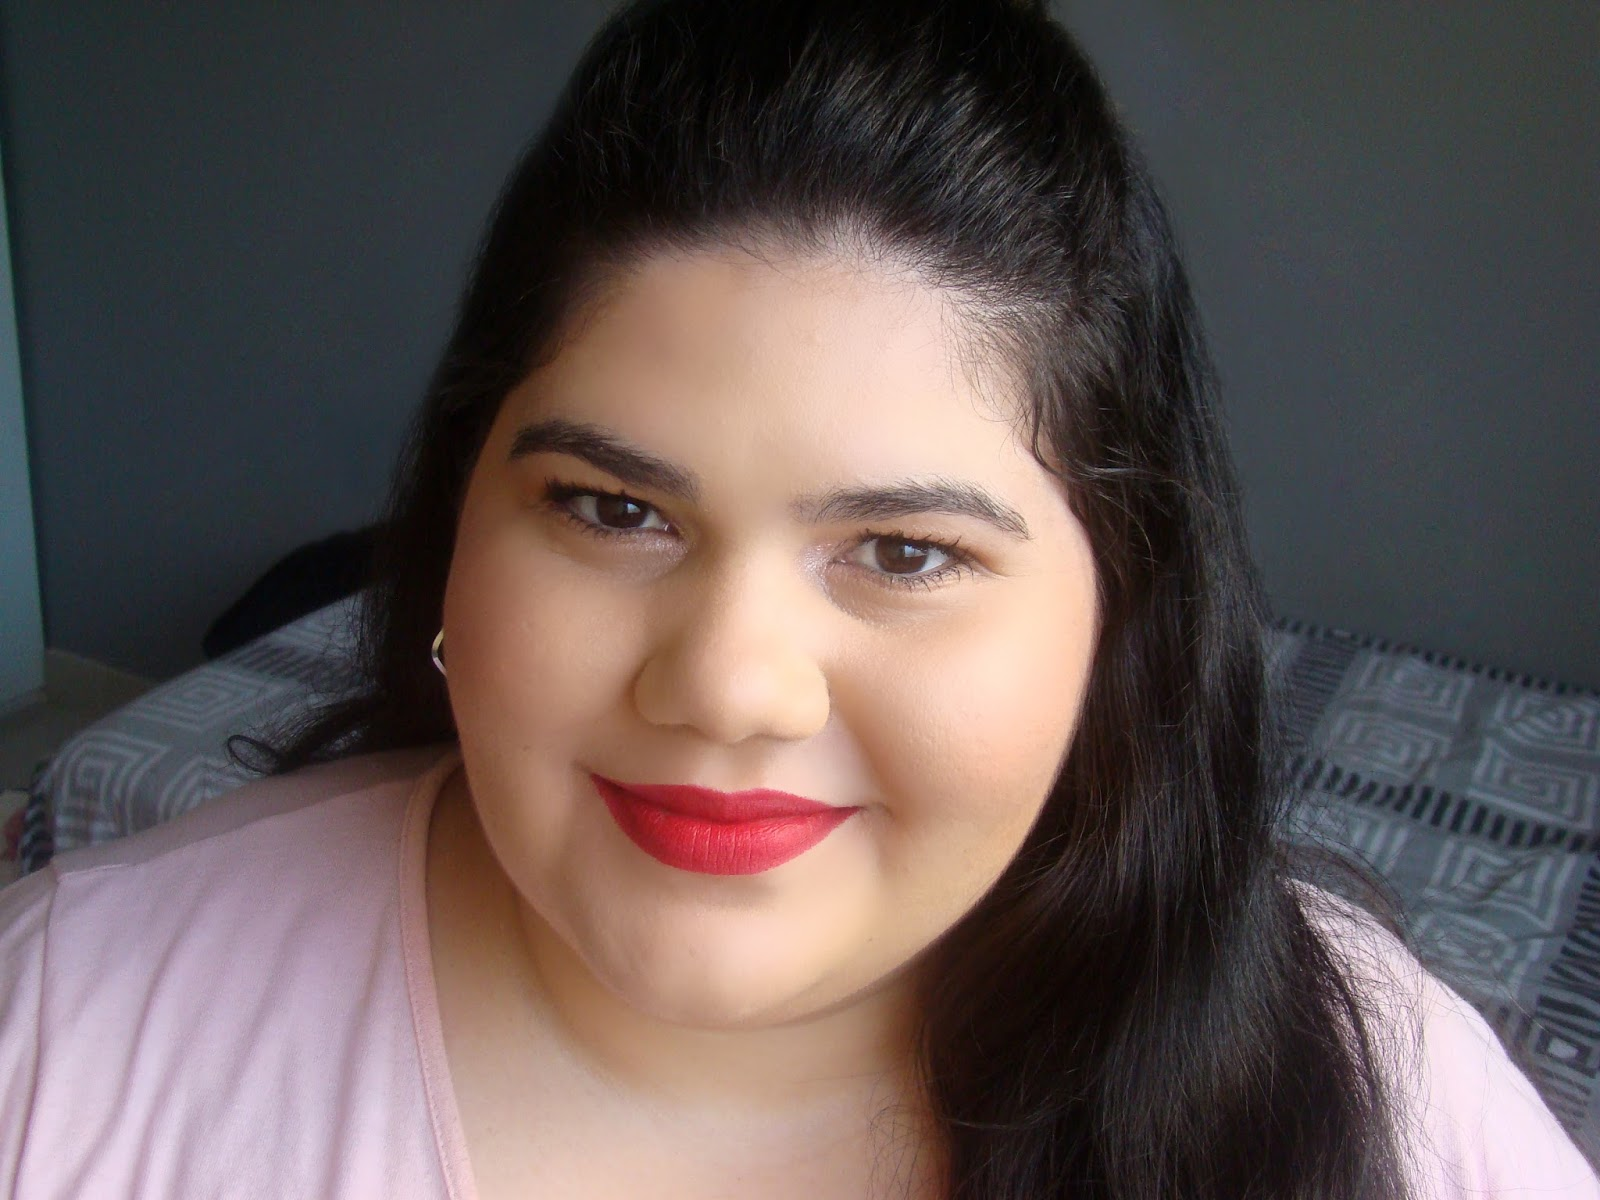 Batons Favorito vermelho ruby woo mac cosmetics makeup lipstick red lips maquiagem mate retro matte